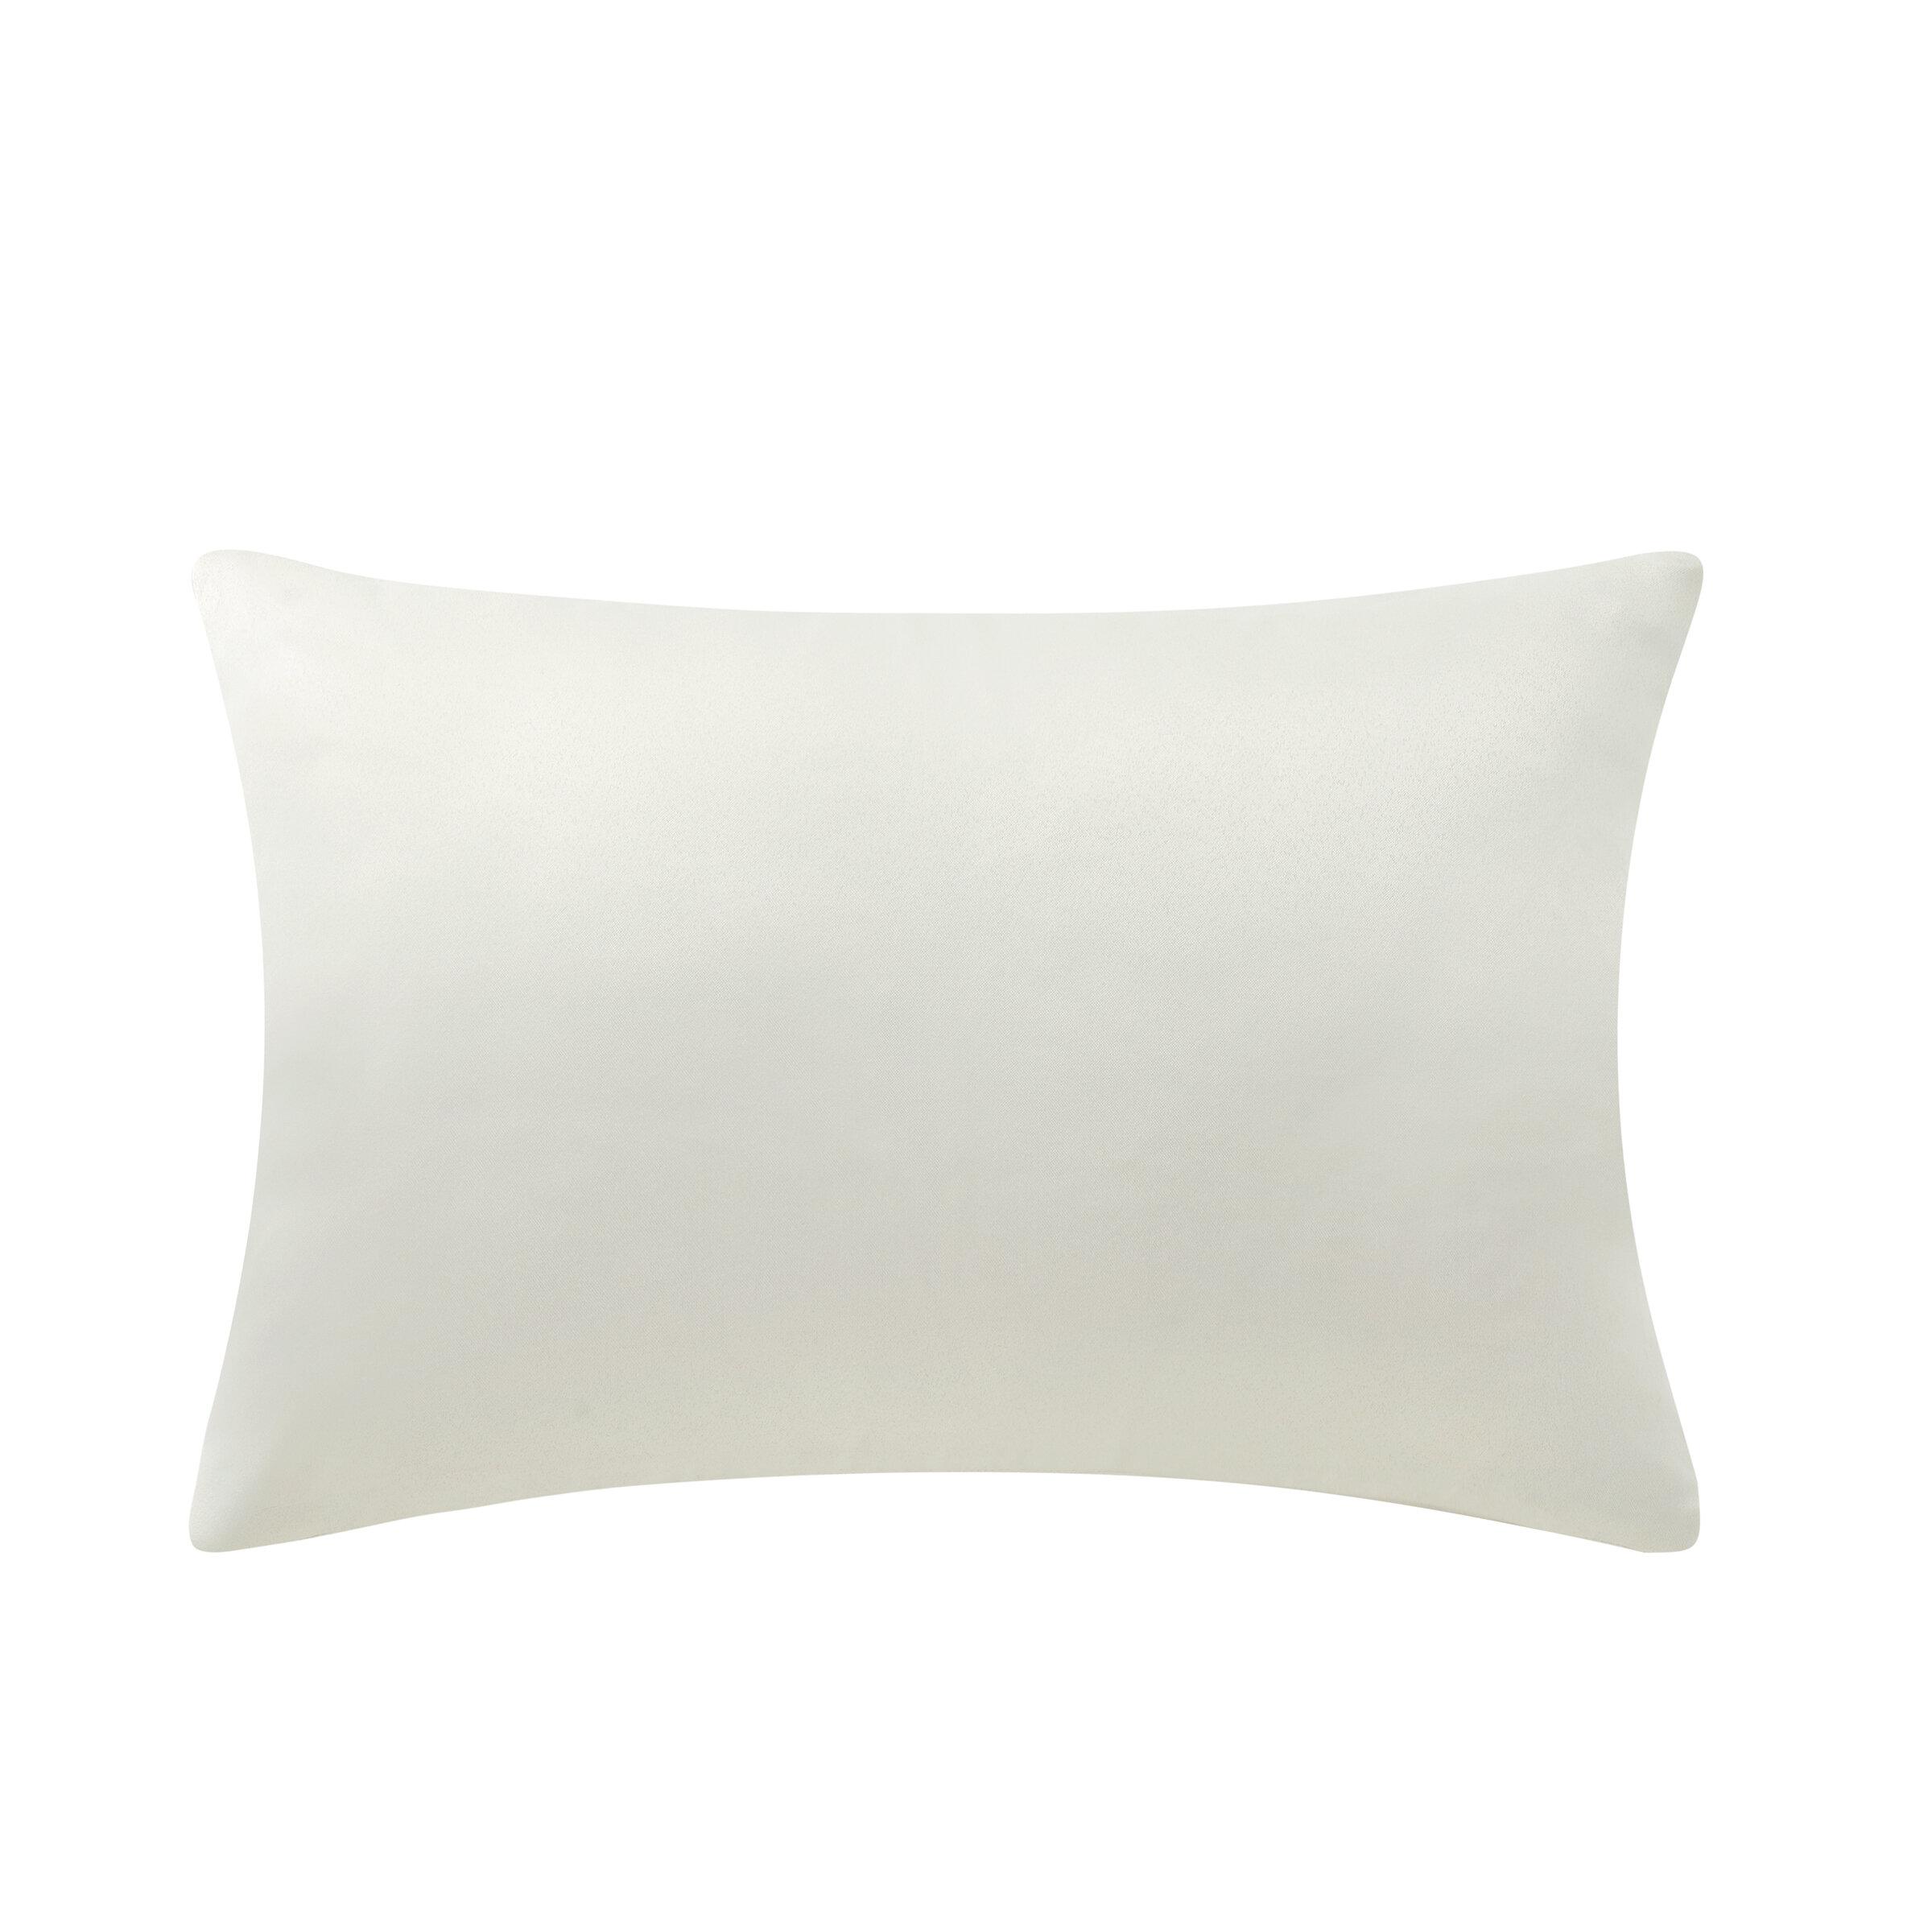 Waterford Bedding Fairlane Throw Pillow Wayfair